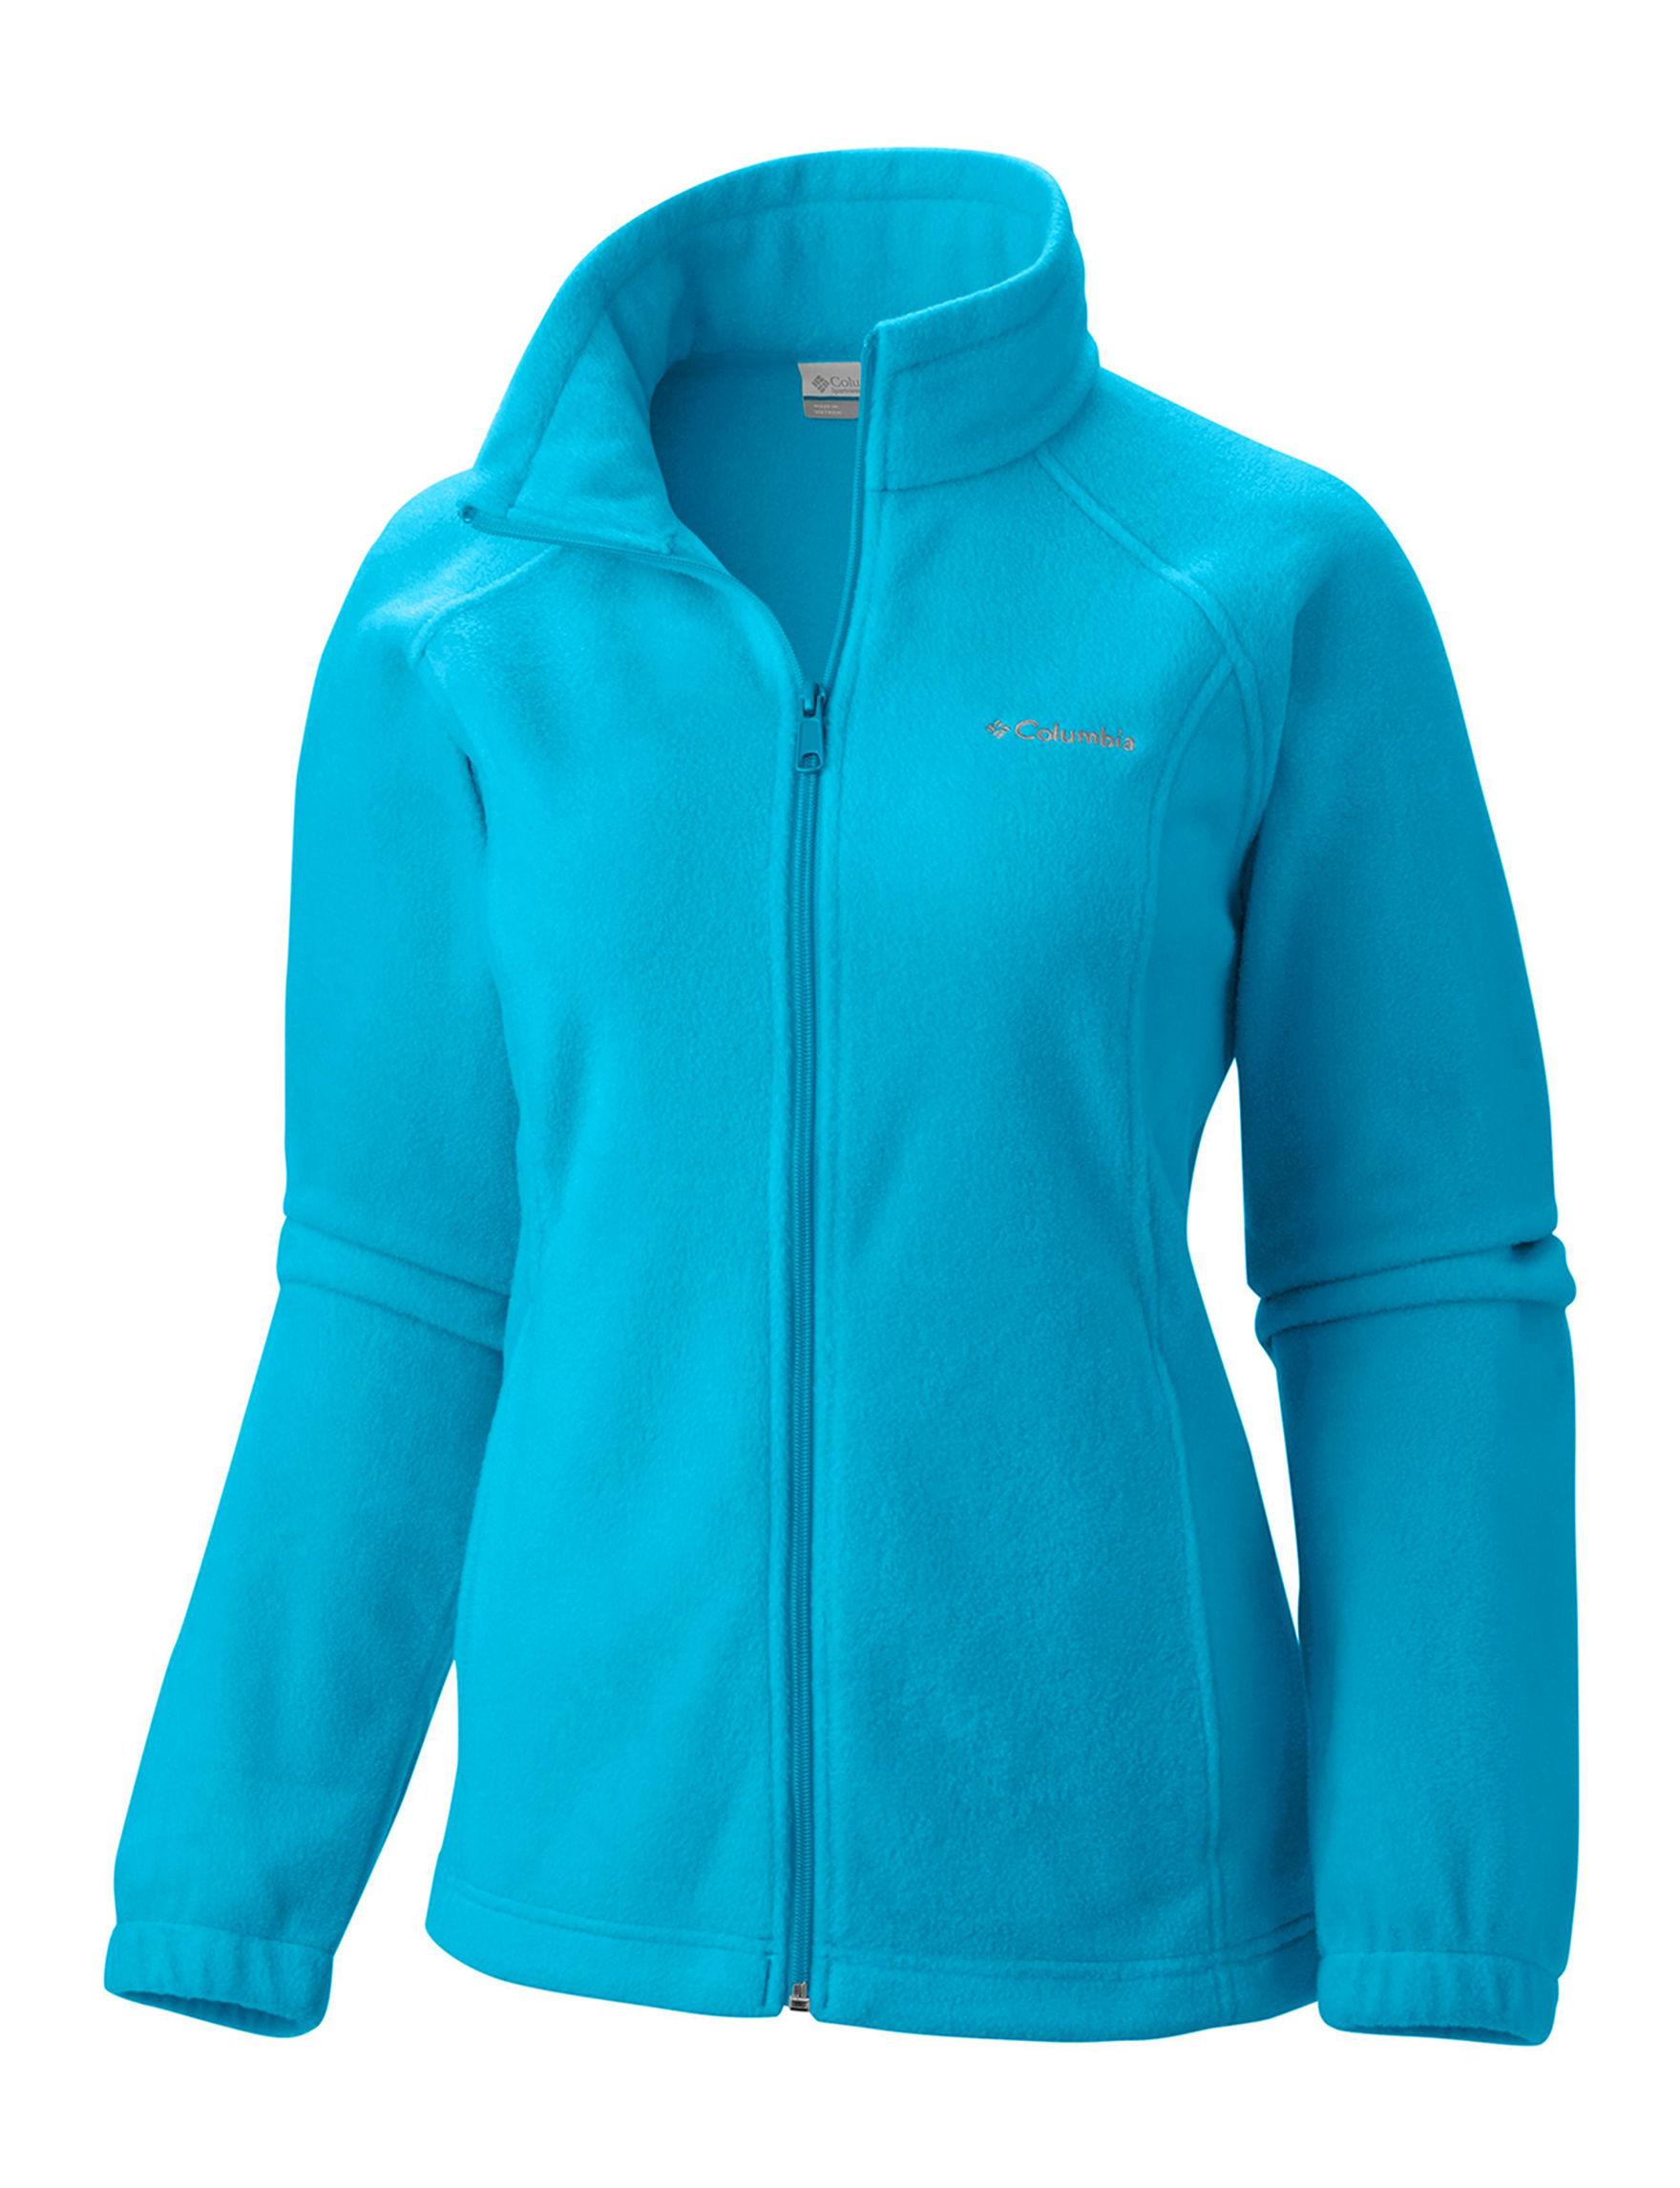 Columbia Turquoise Fleece & Soft Shell Jackets Lightweight Jackets & Blazers